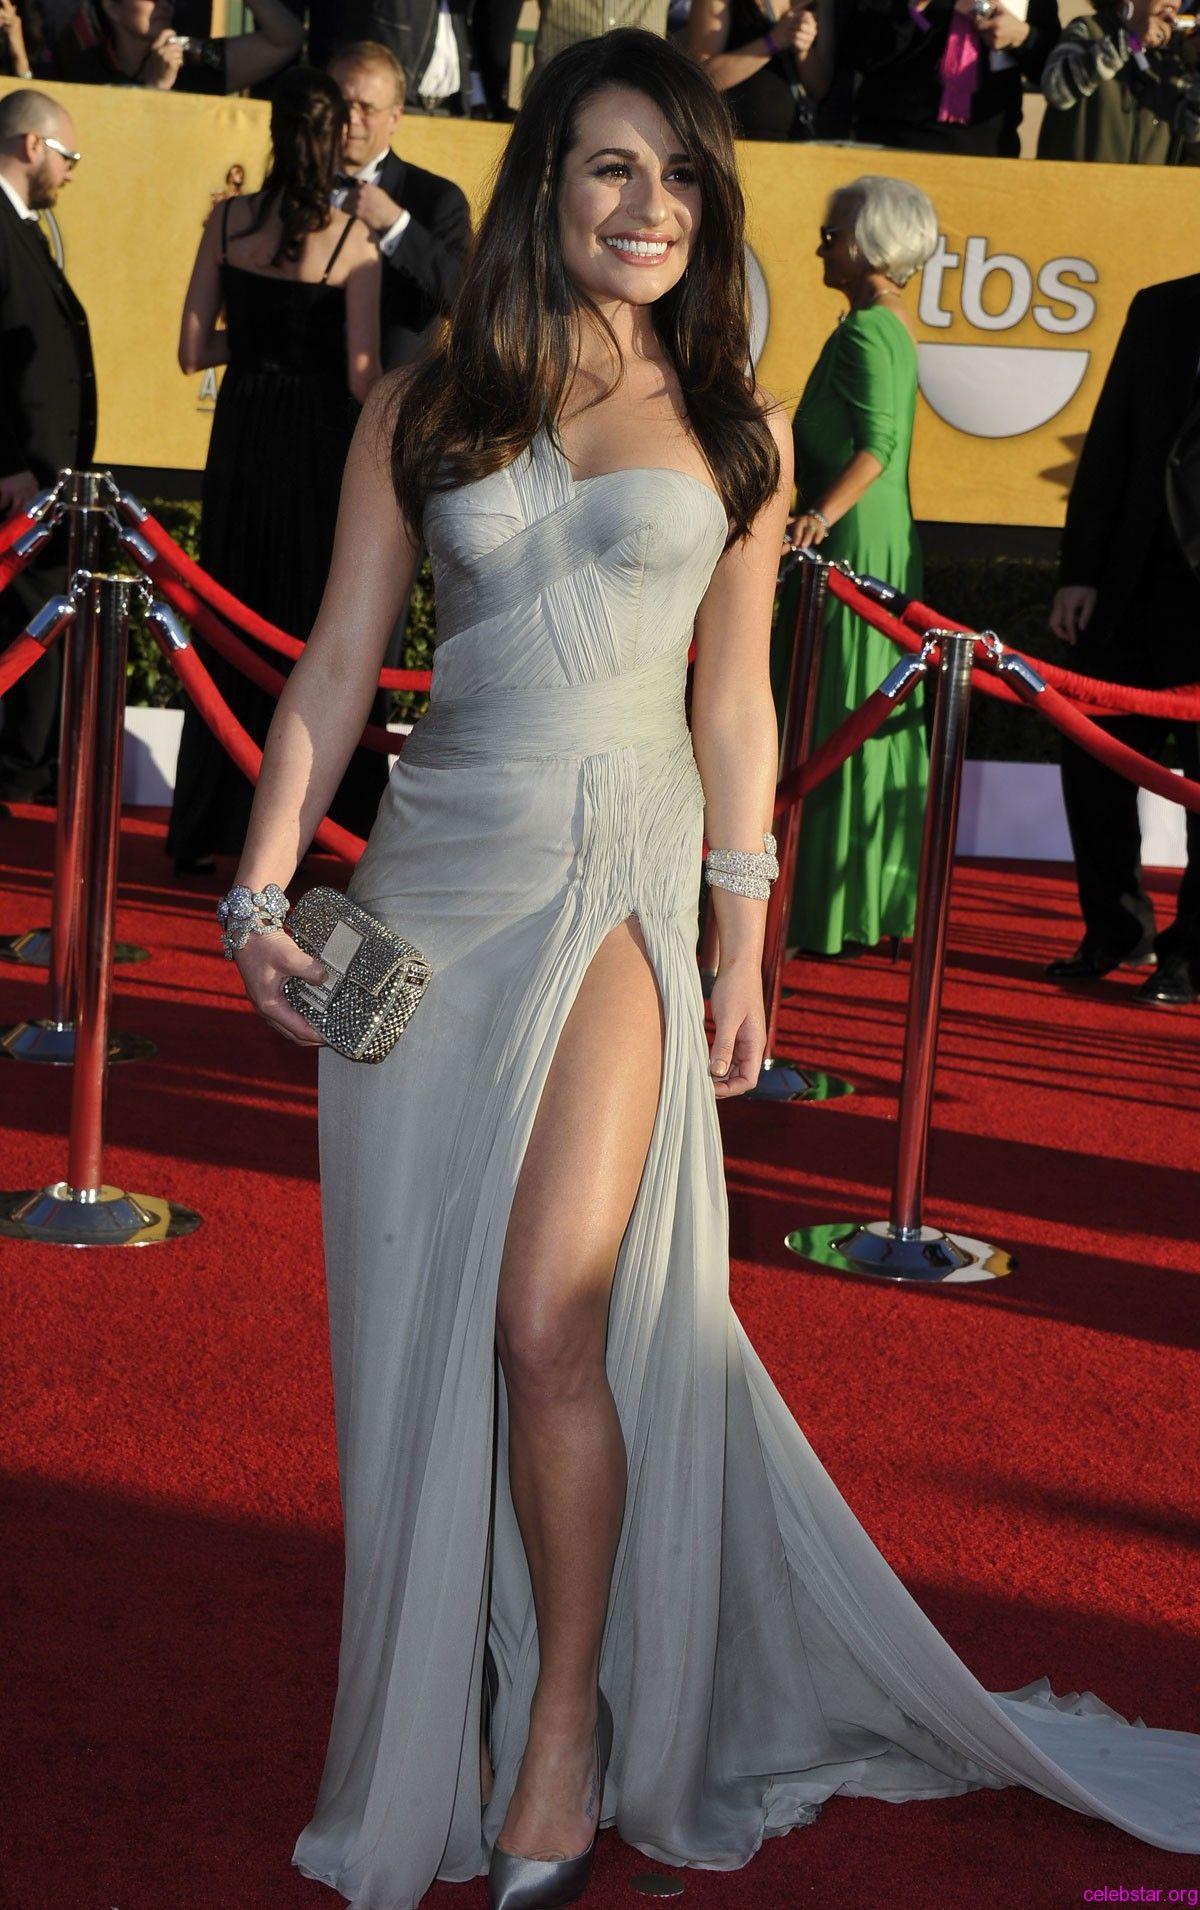 729628a9de600a Lea-Michele-Versace-red-carpet-dress-2012-SAG-Awards-1.jpg (1200 ...